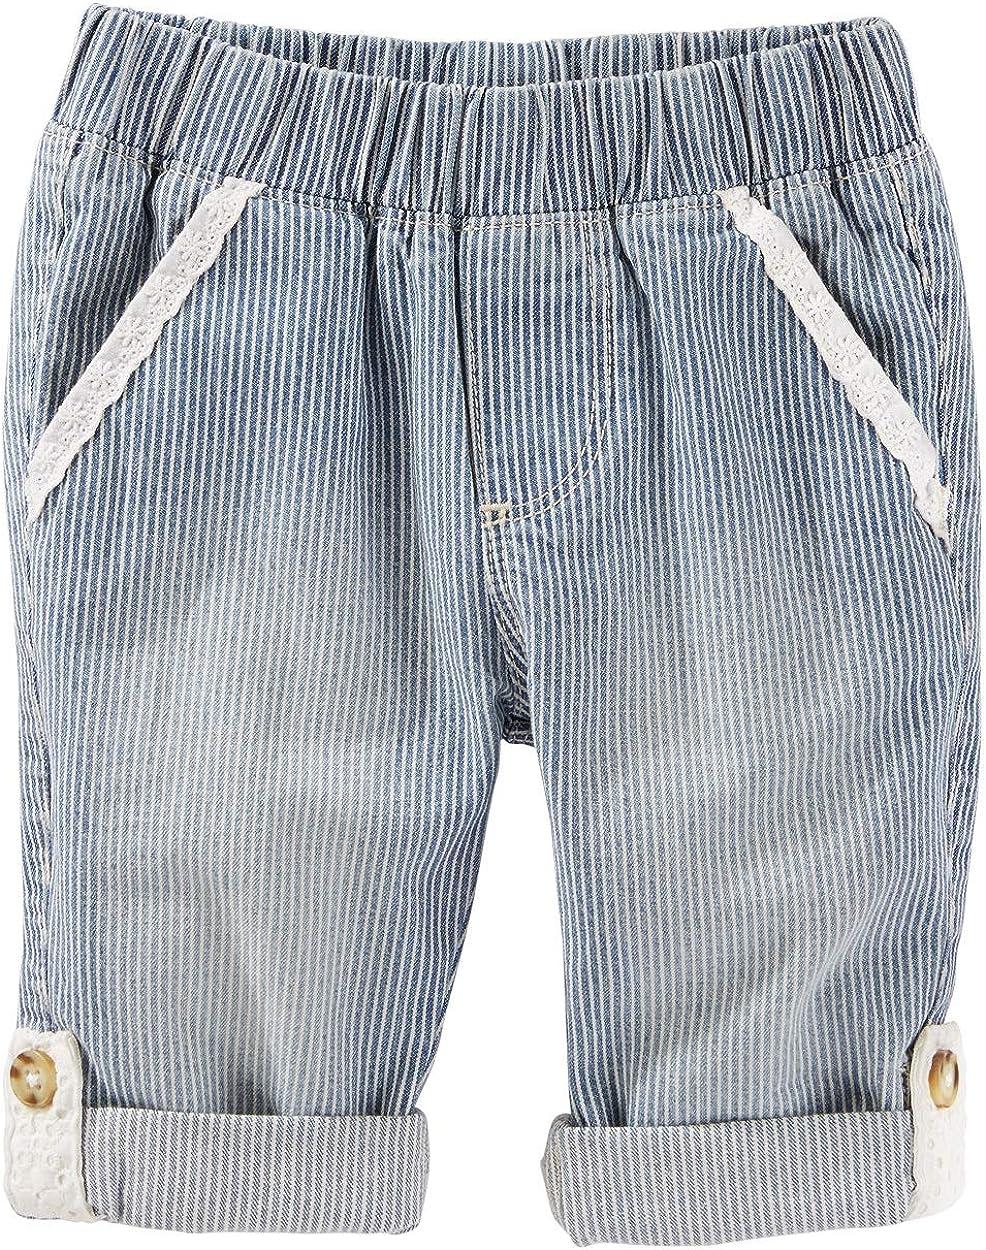 Oshkosh Bgosh Pull On Covertible Hickory Stripe Pants